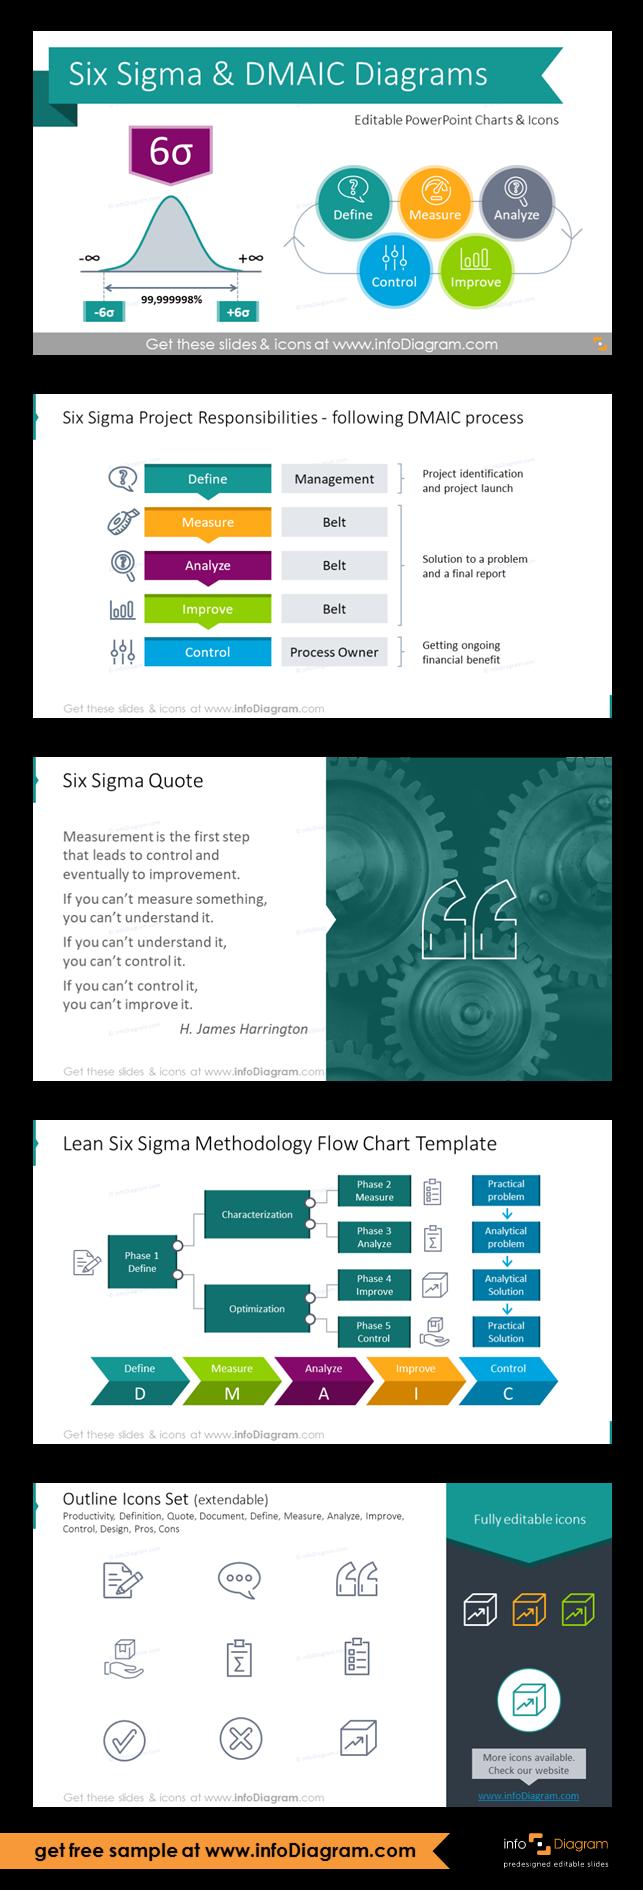 Six Sigma Presentation DMAIC Diagrams (PPT template) | Work